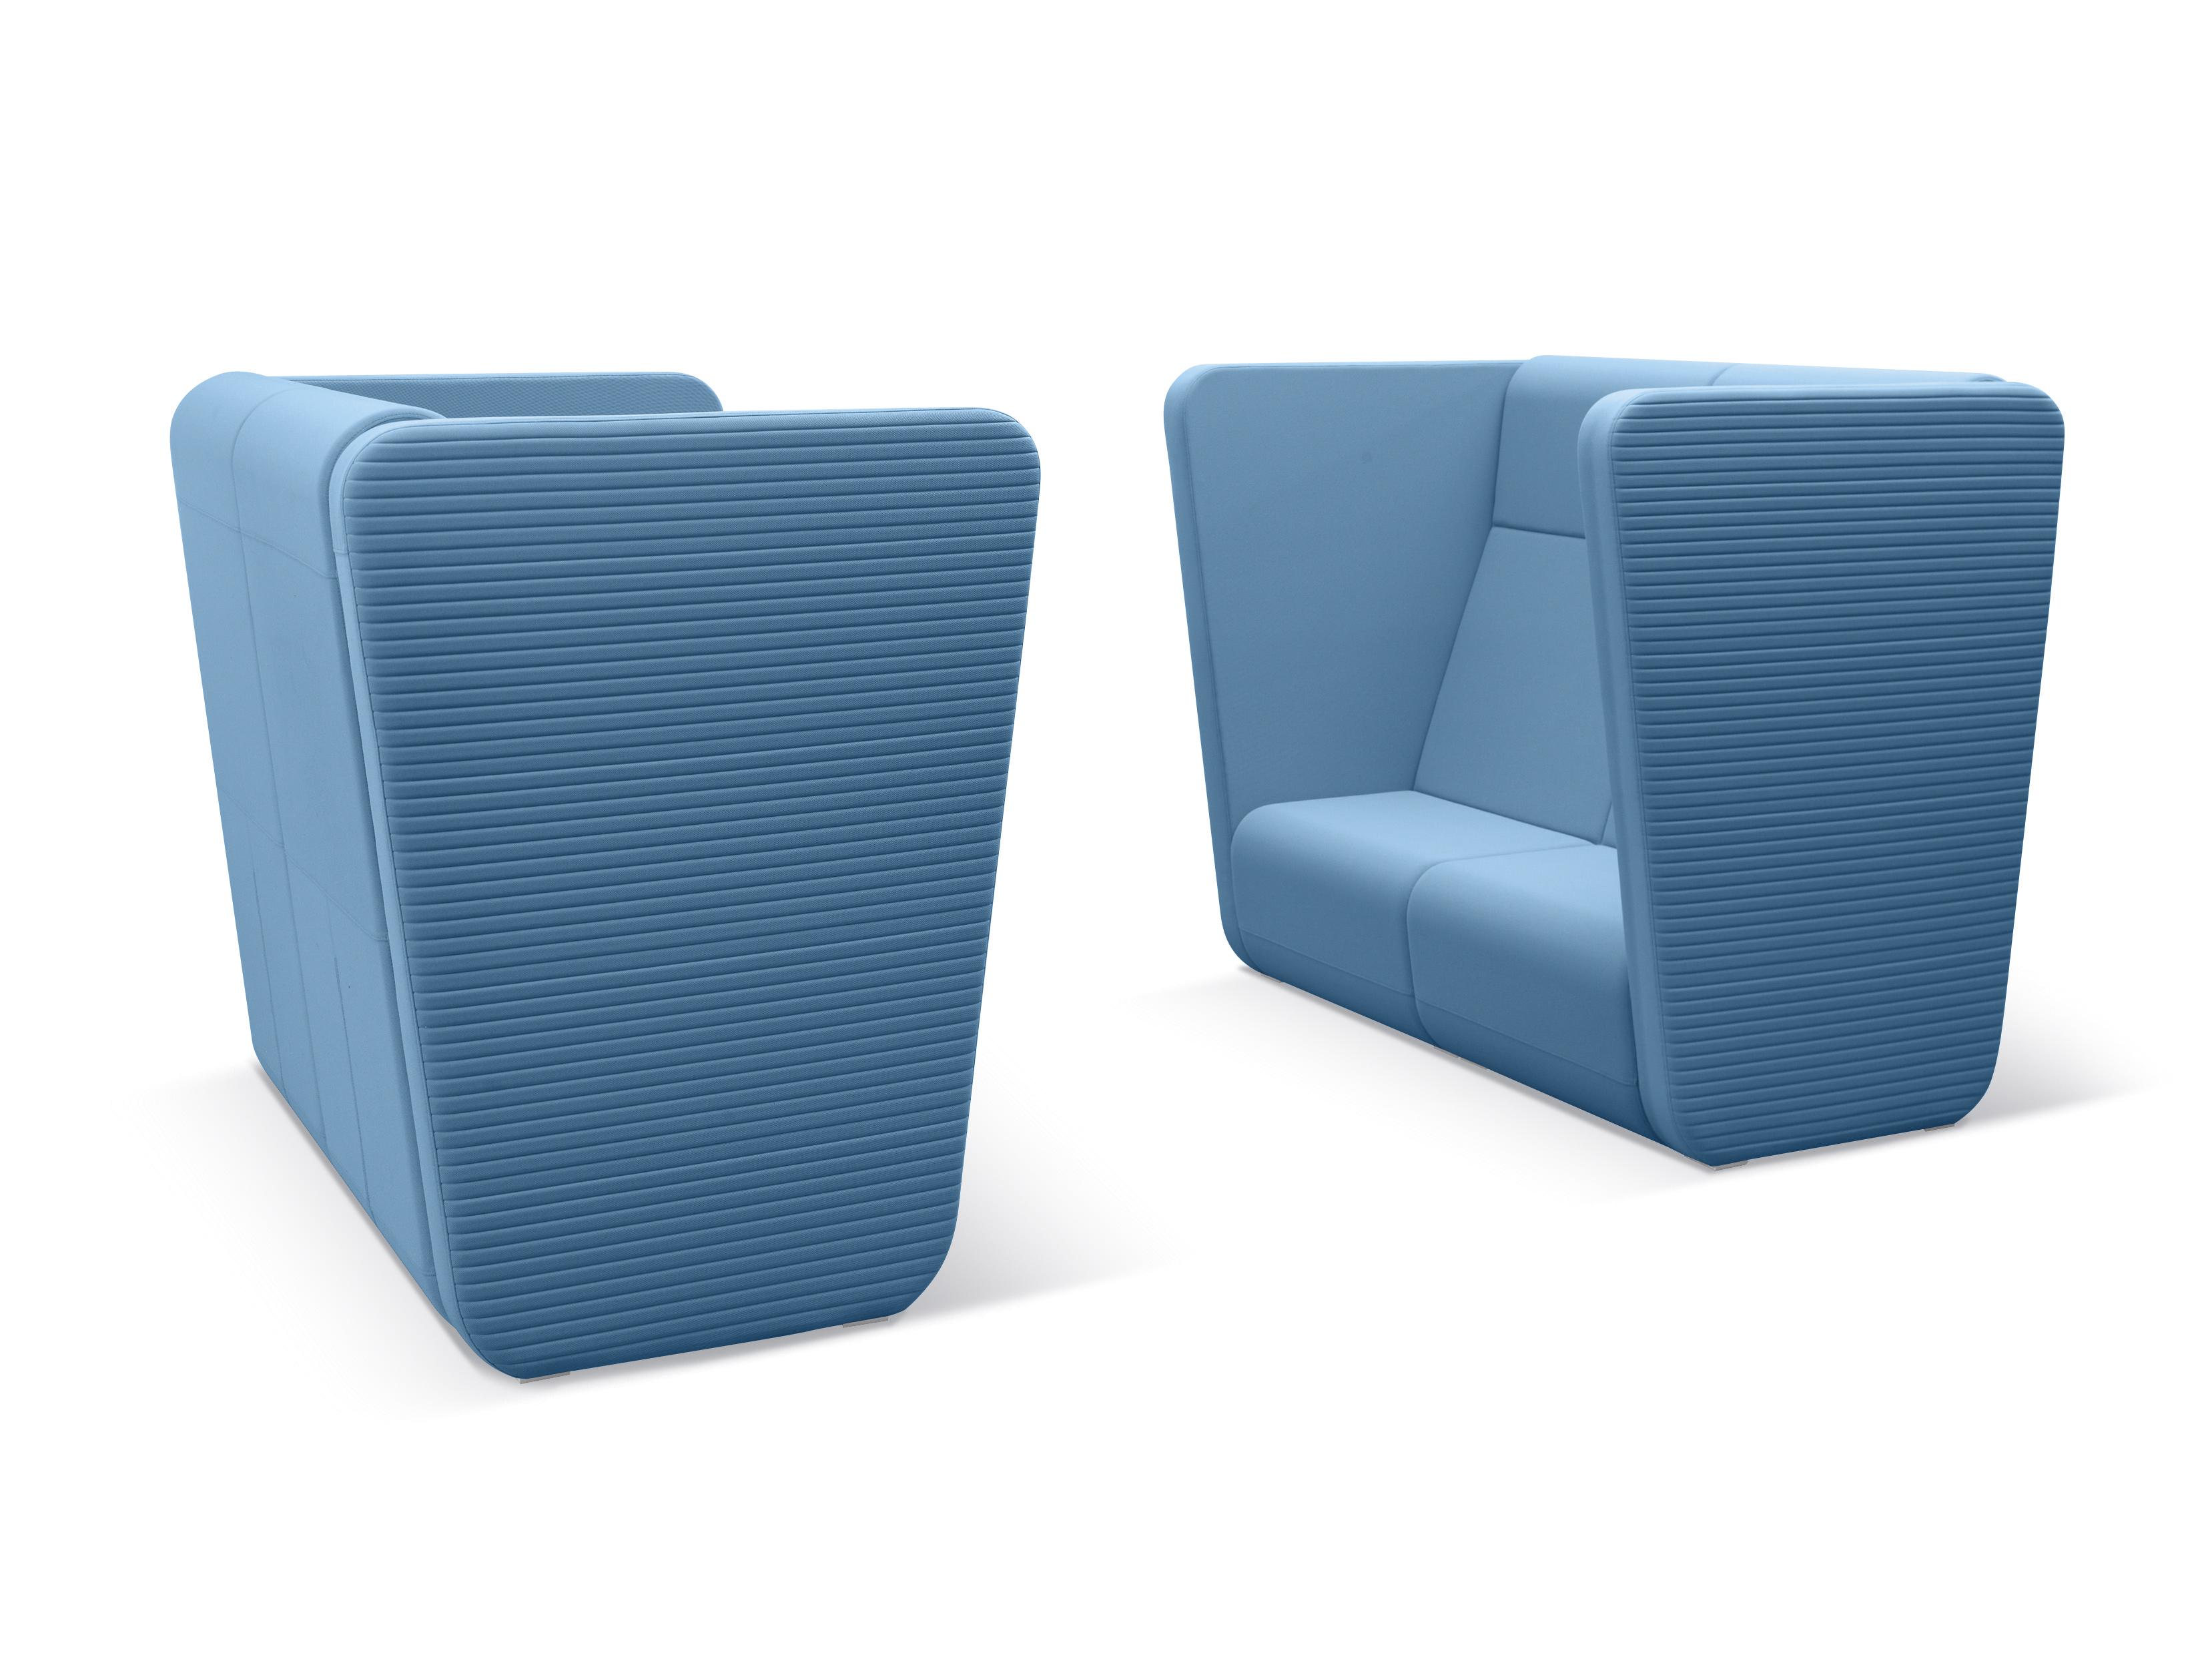 polsterm bel meet me loungesessel kommunikationsm bel besprechungsm bel kommunikationsecken. Black Bedroom Furniture Sets. Home Design Ideas